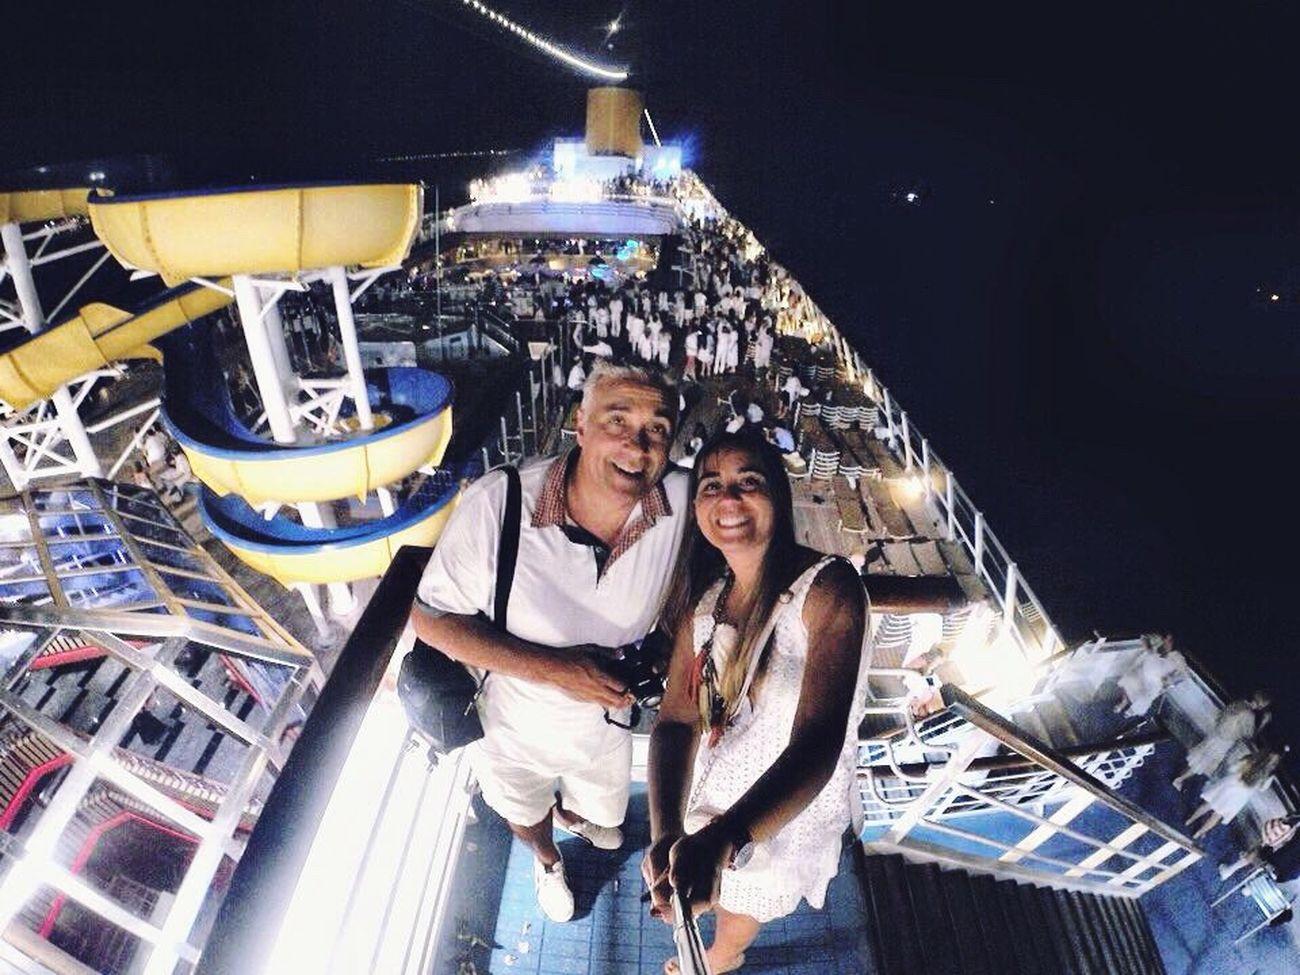 Feel The Journey Cruise Hollidays Brazil NewYear Taking Photos Photooftheday Photography